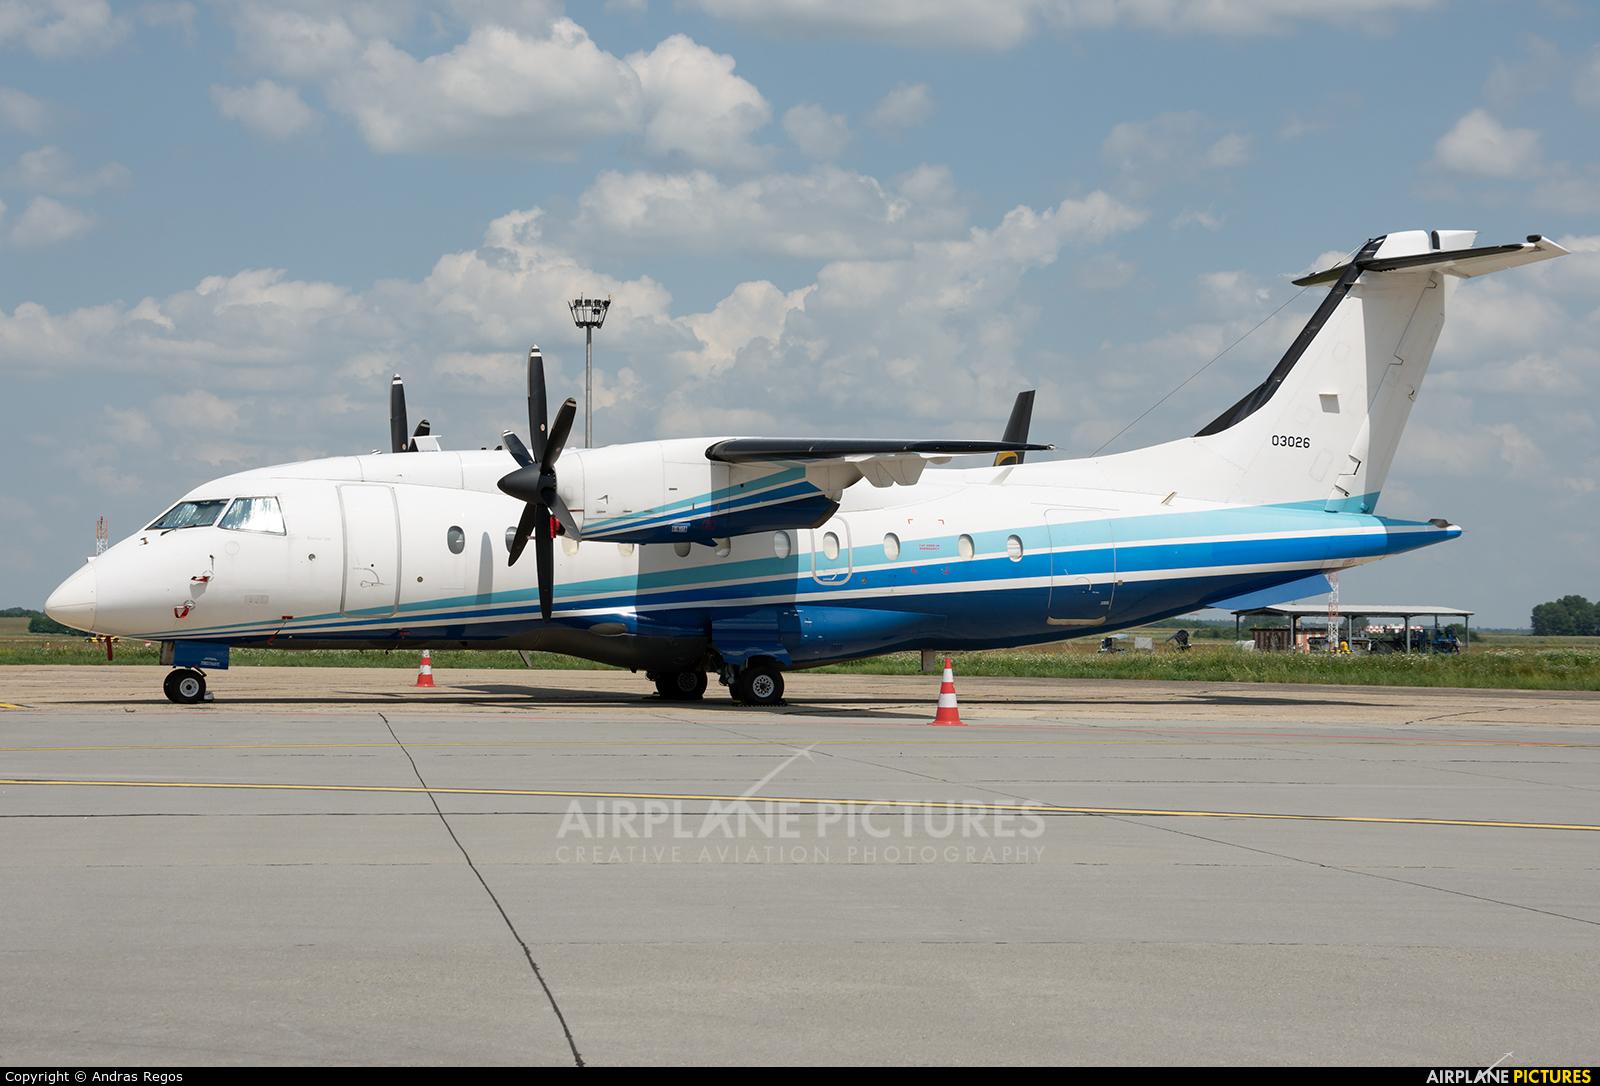 USA - Air Force 10-3026 aircraft at Budapest Ferenc Liszt International Airport